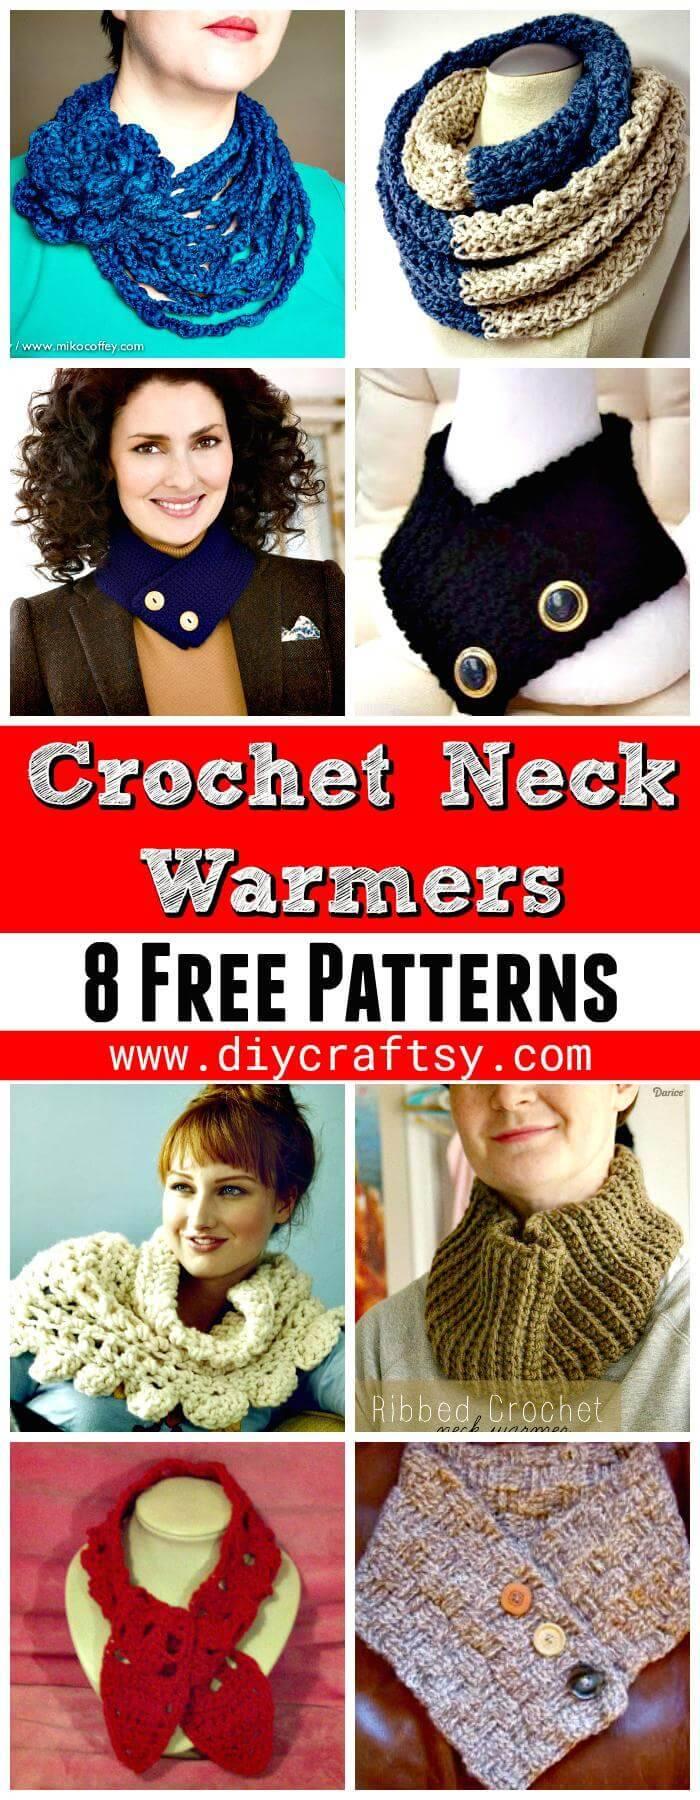 Free Crochet Neck Warmer Patterns